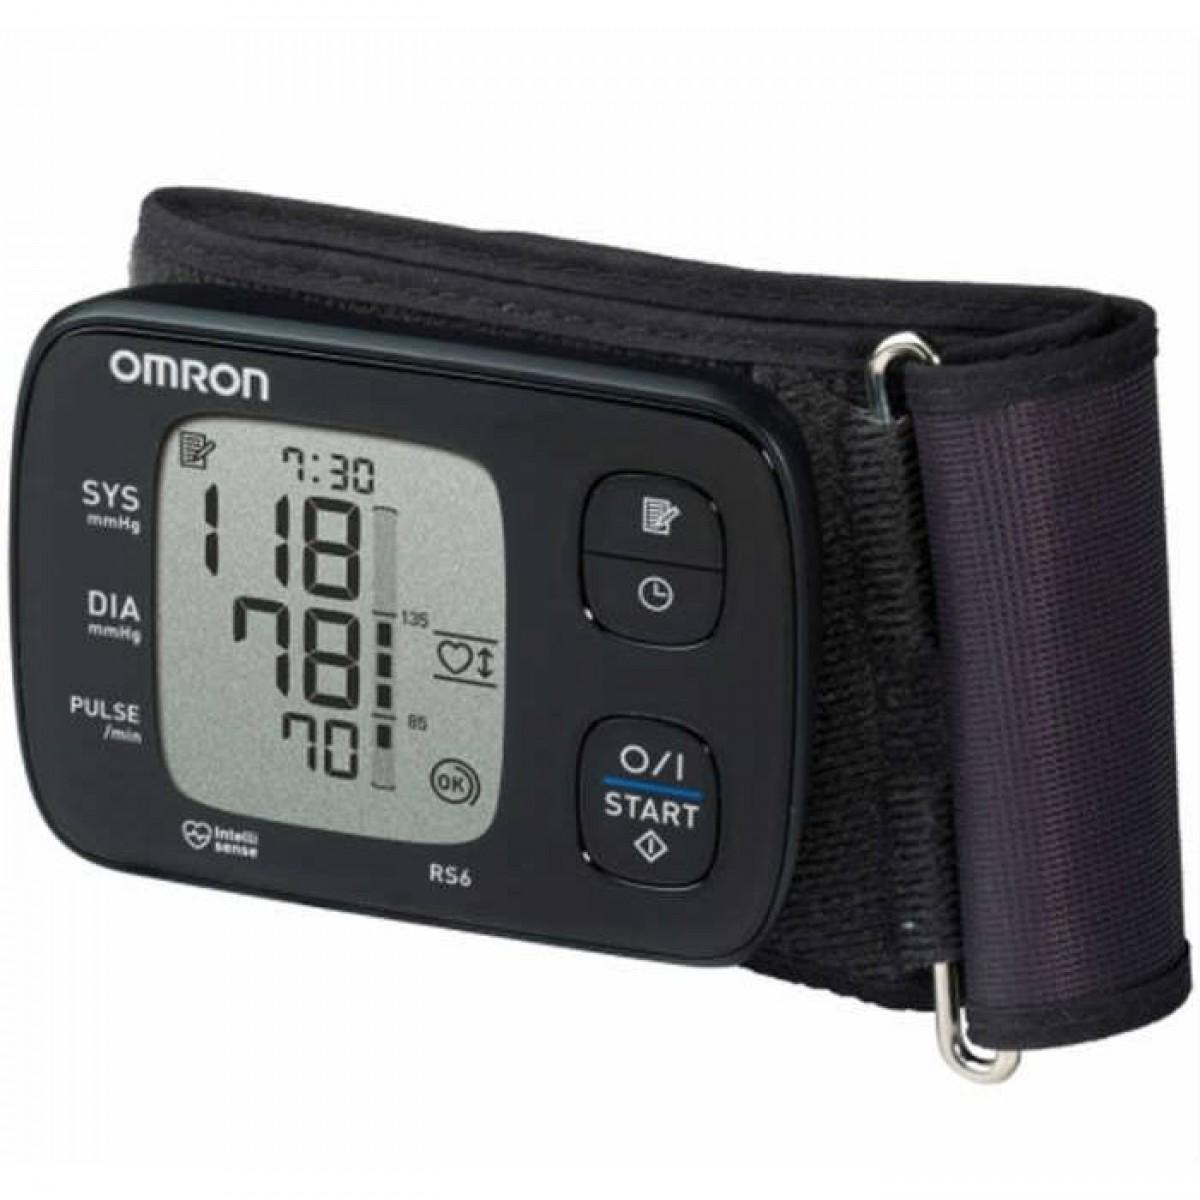 Omron RS6 Ultra Kompakt Sensörlü Bilekten Ölçer